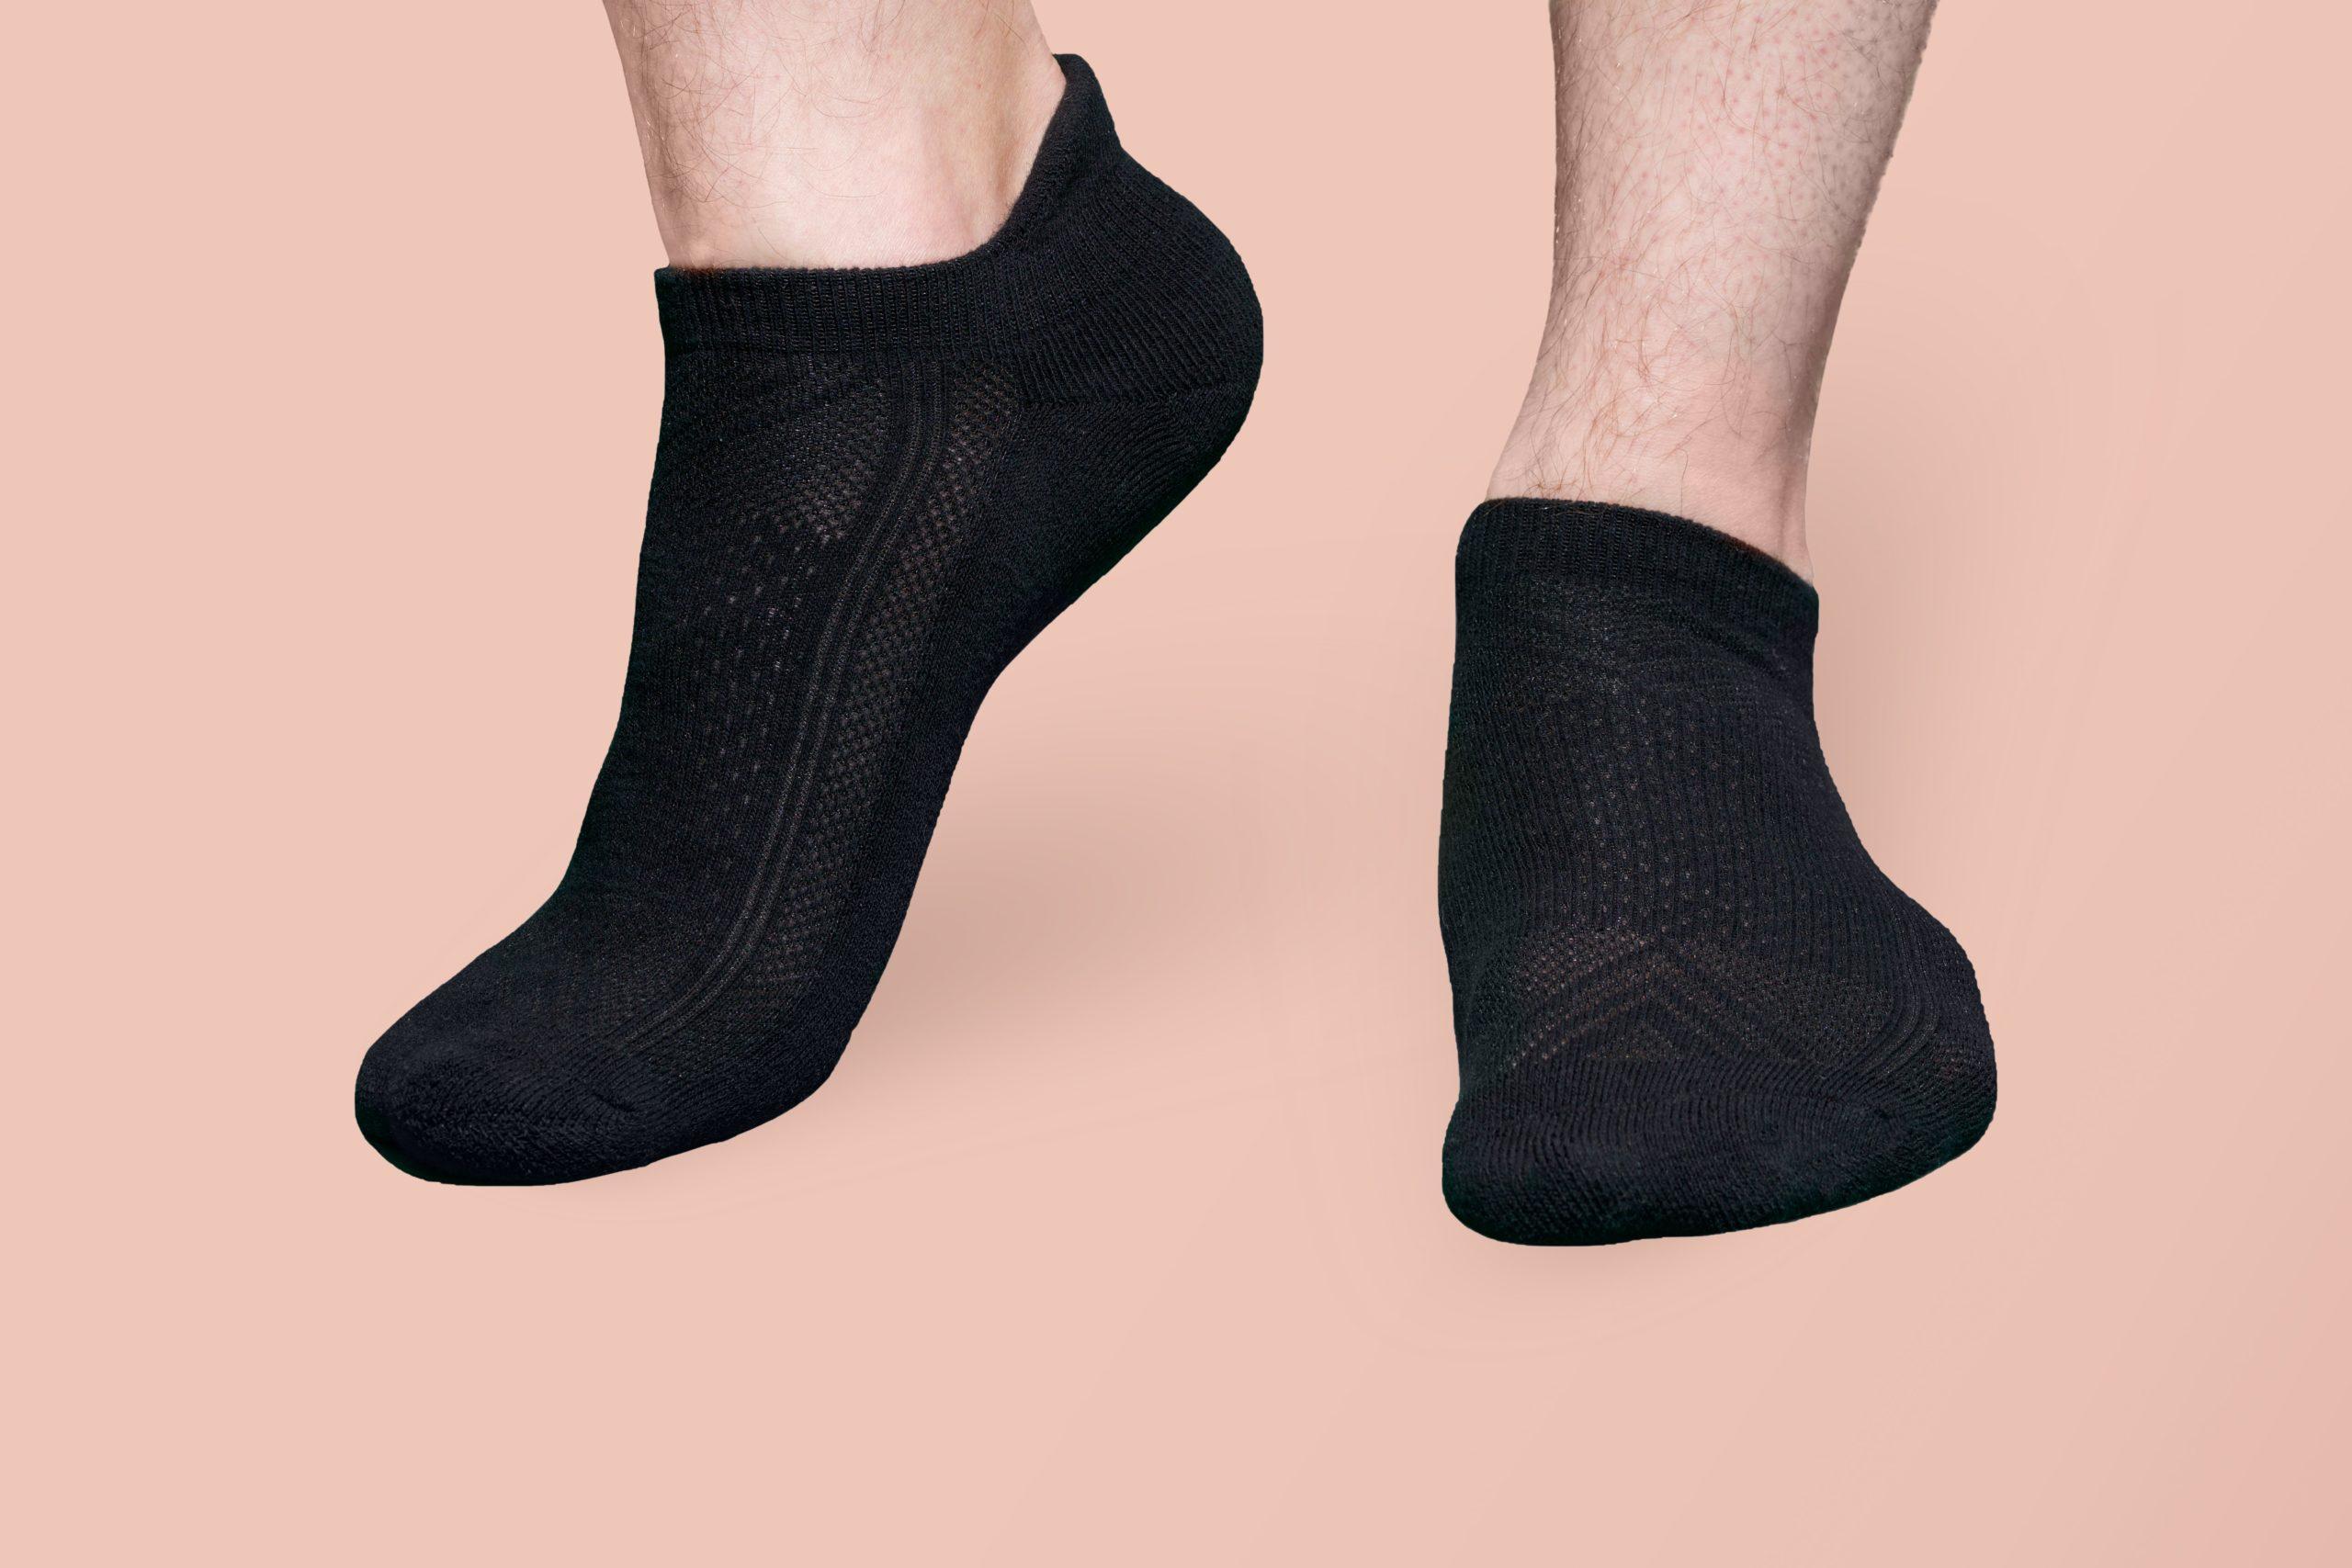 25 Best Sock Brands for Men + Women in 2021